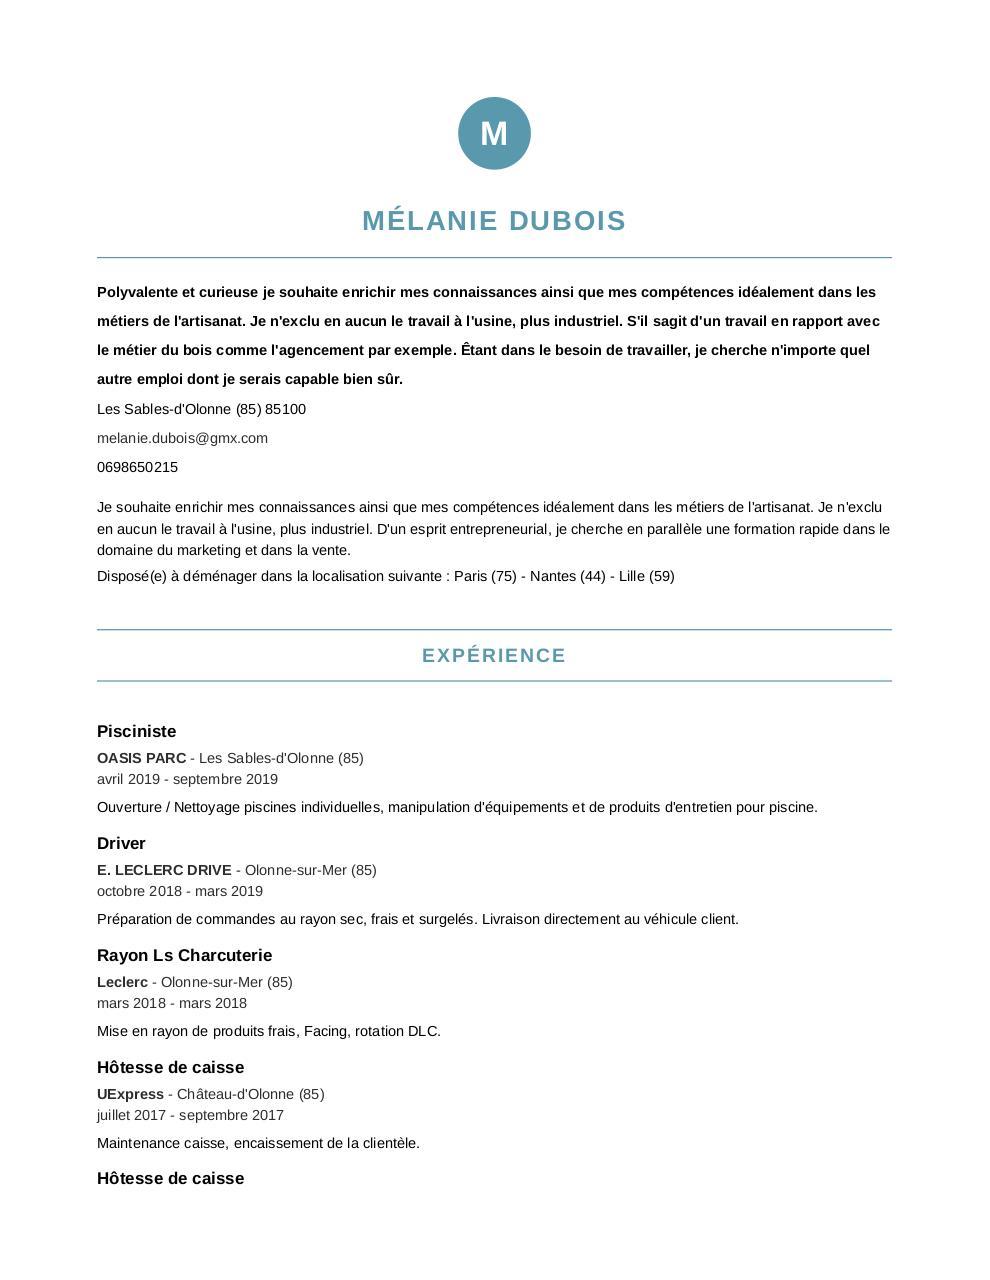 Mélanie Dubois Indeed Com Mélanie Duboiscvindeed Pdf